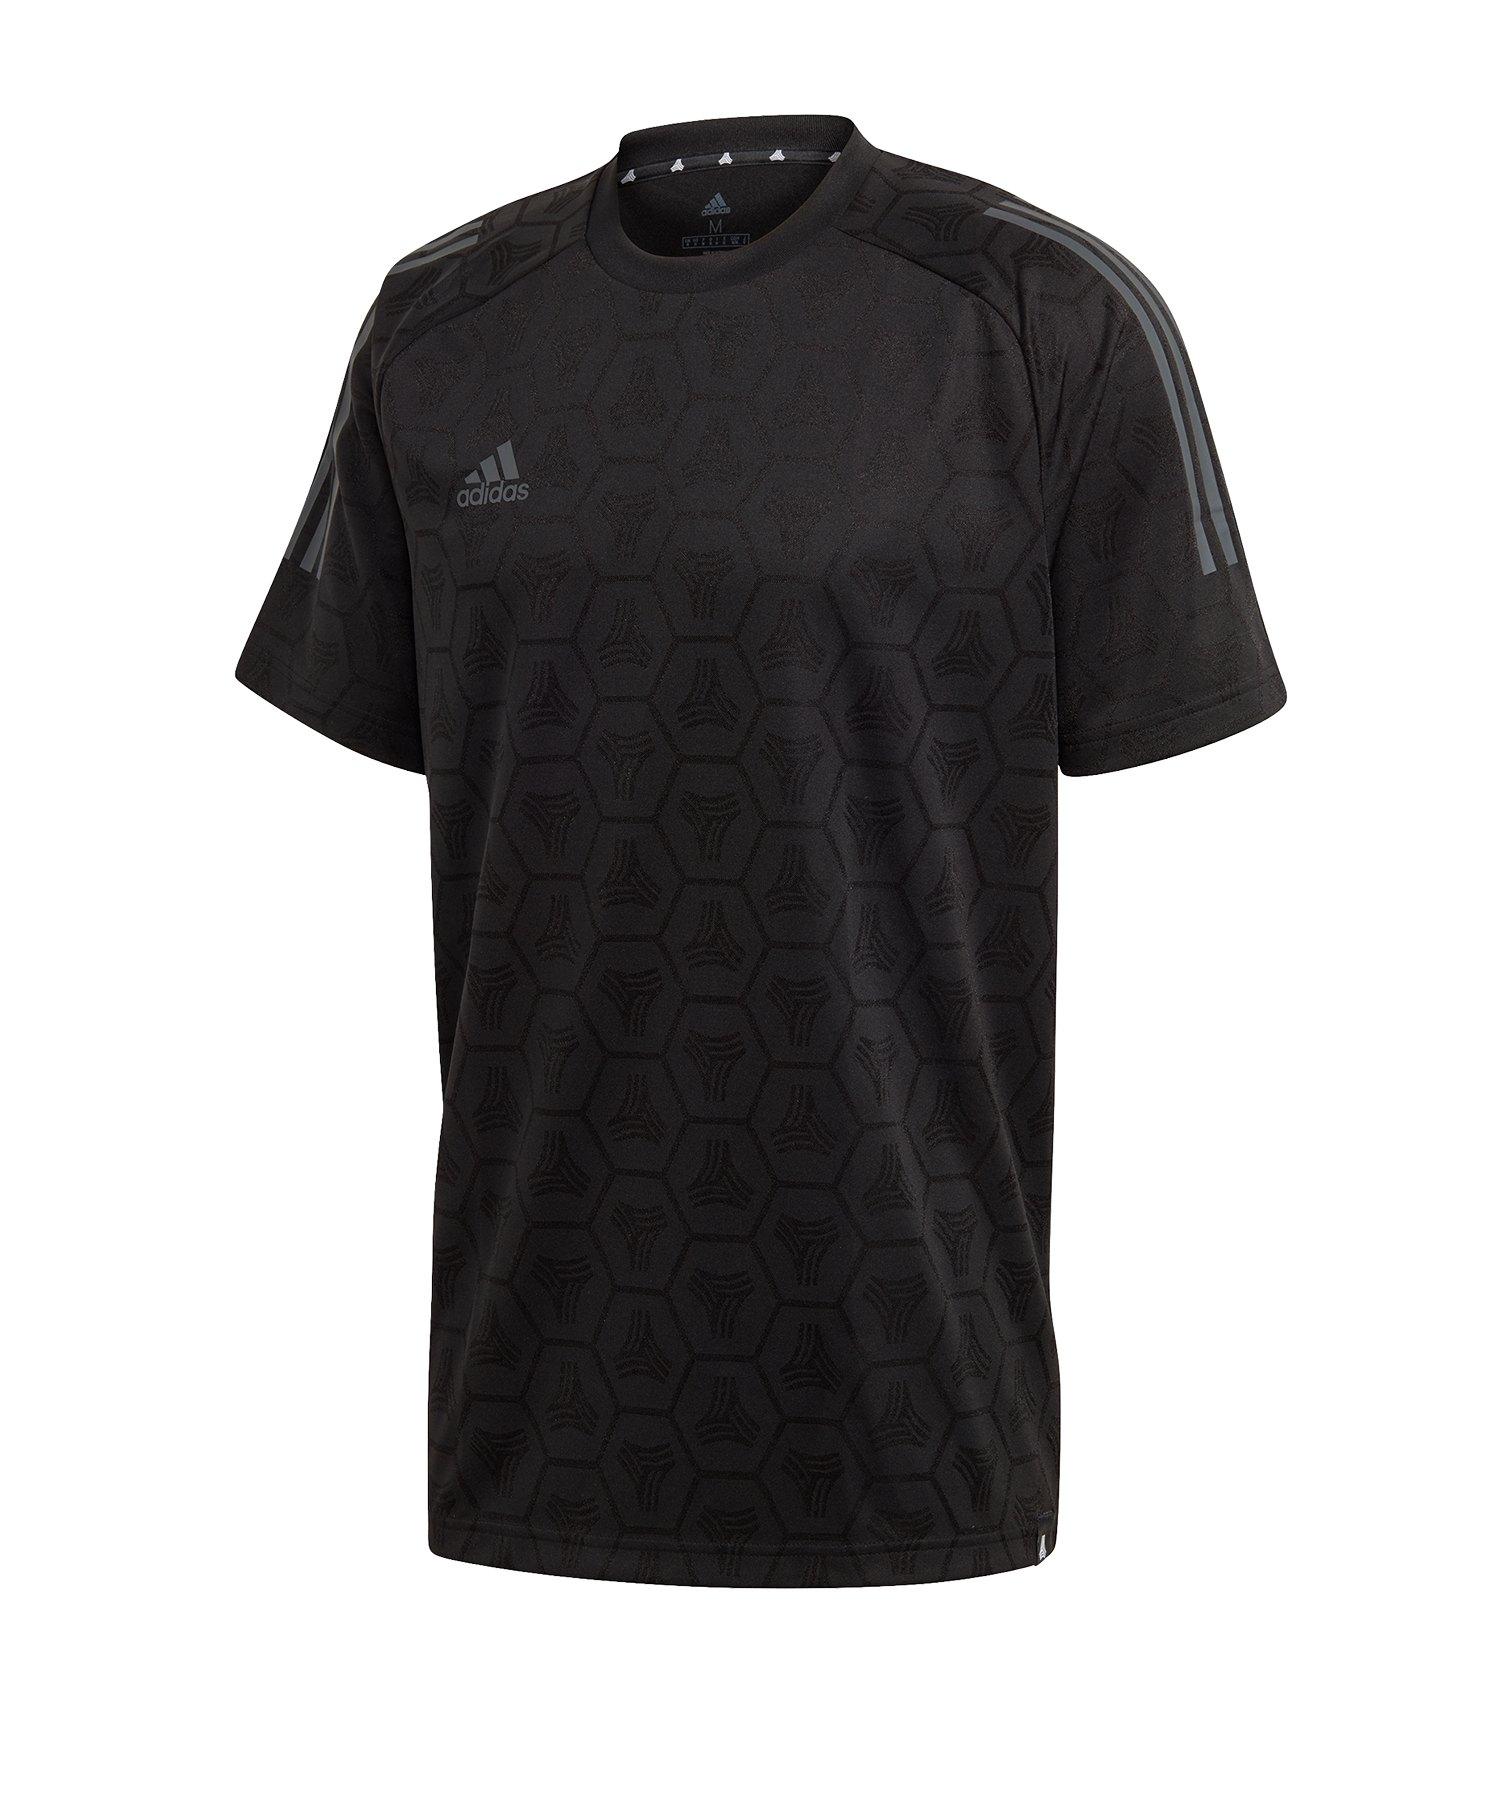 adidas Tango JQD T-Shirt Schwarz - schwarz